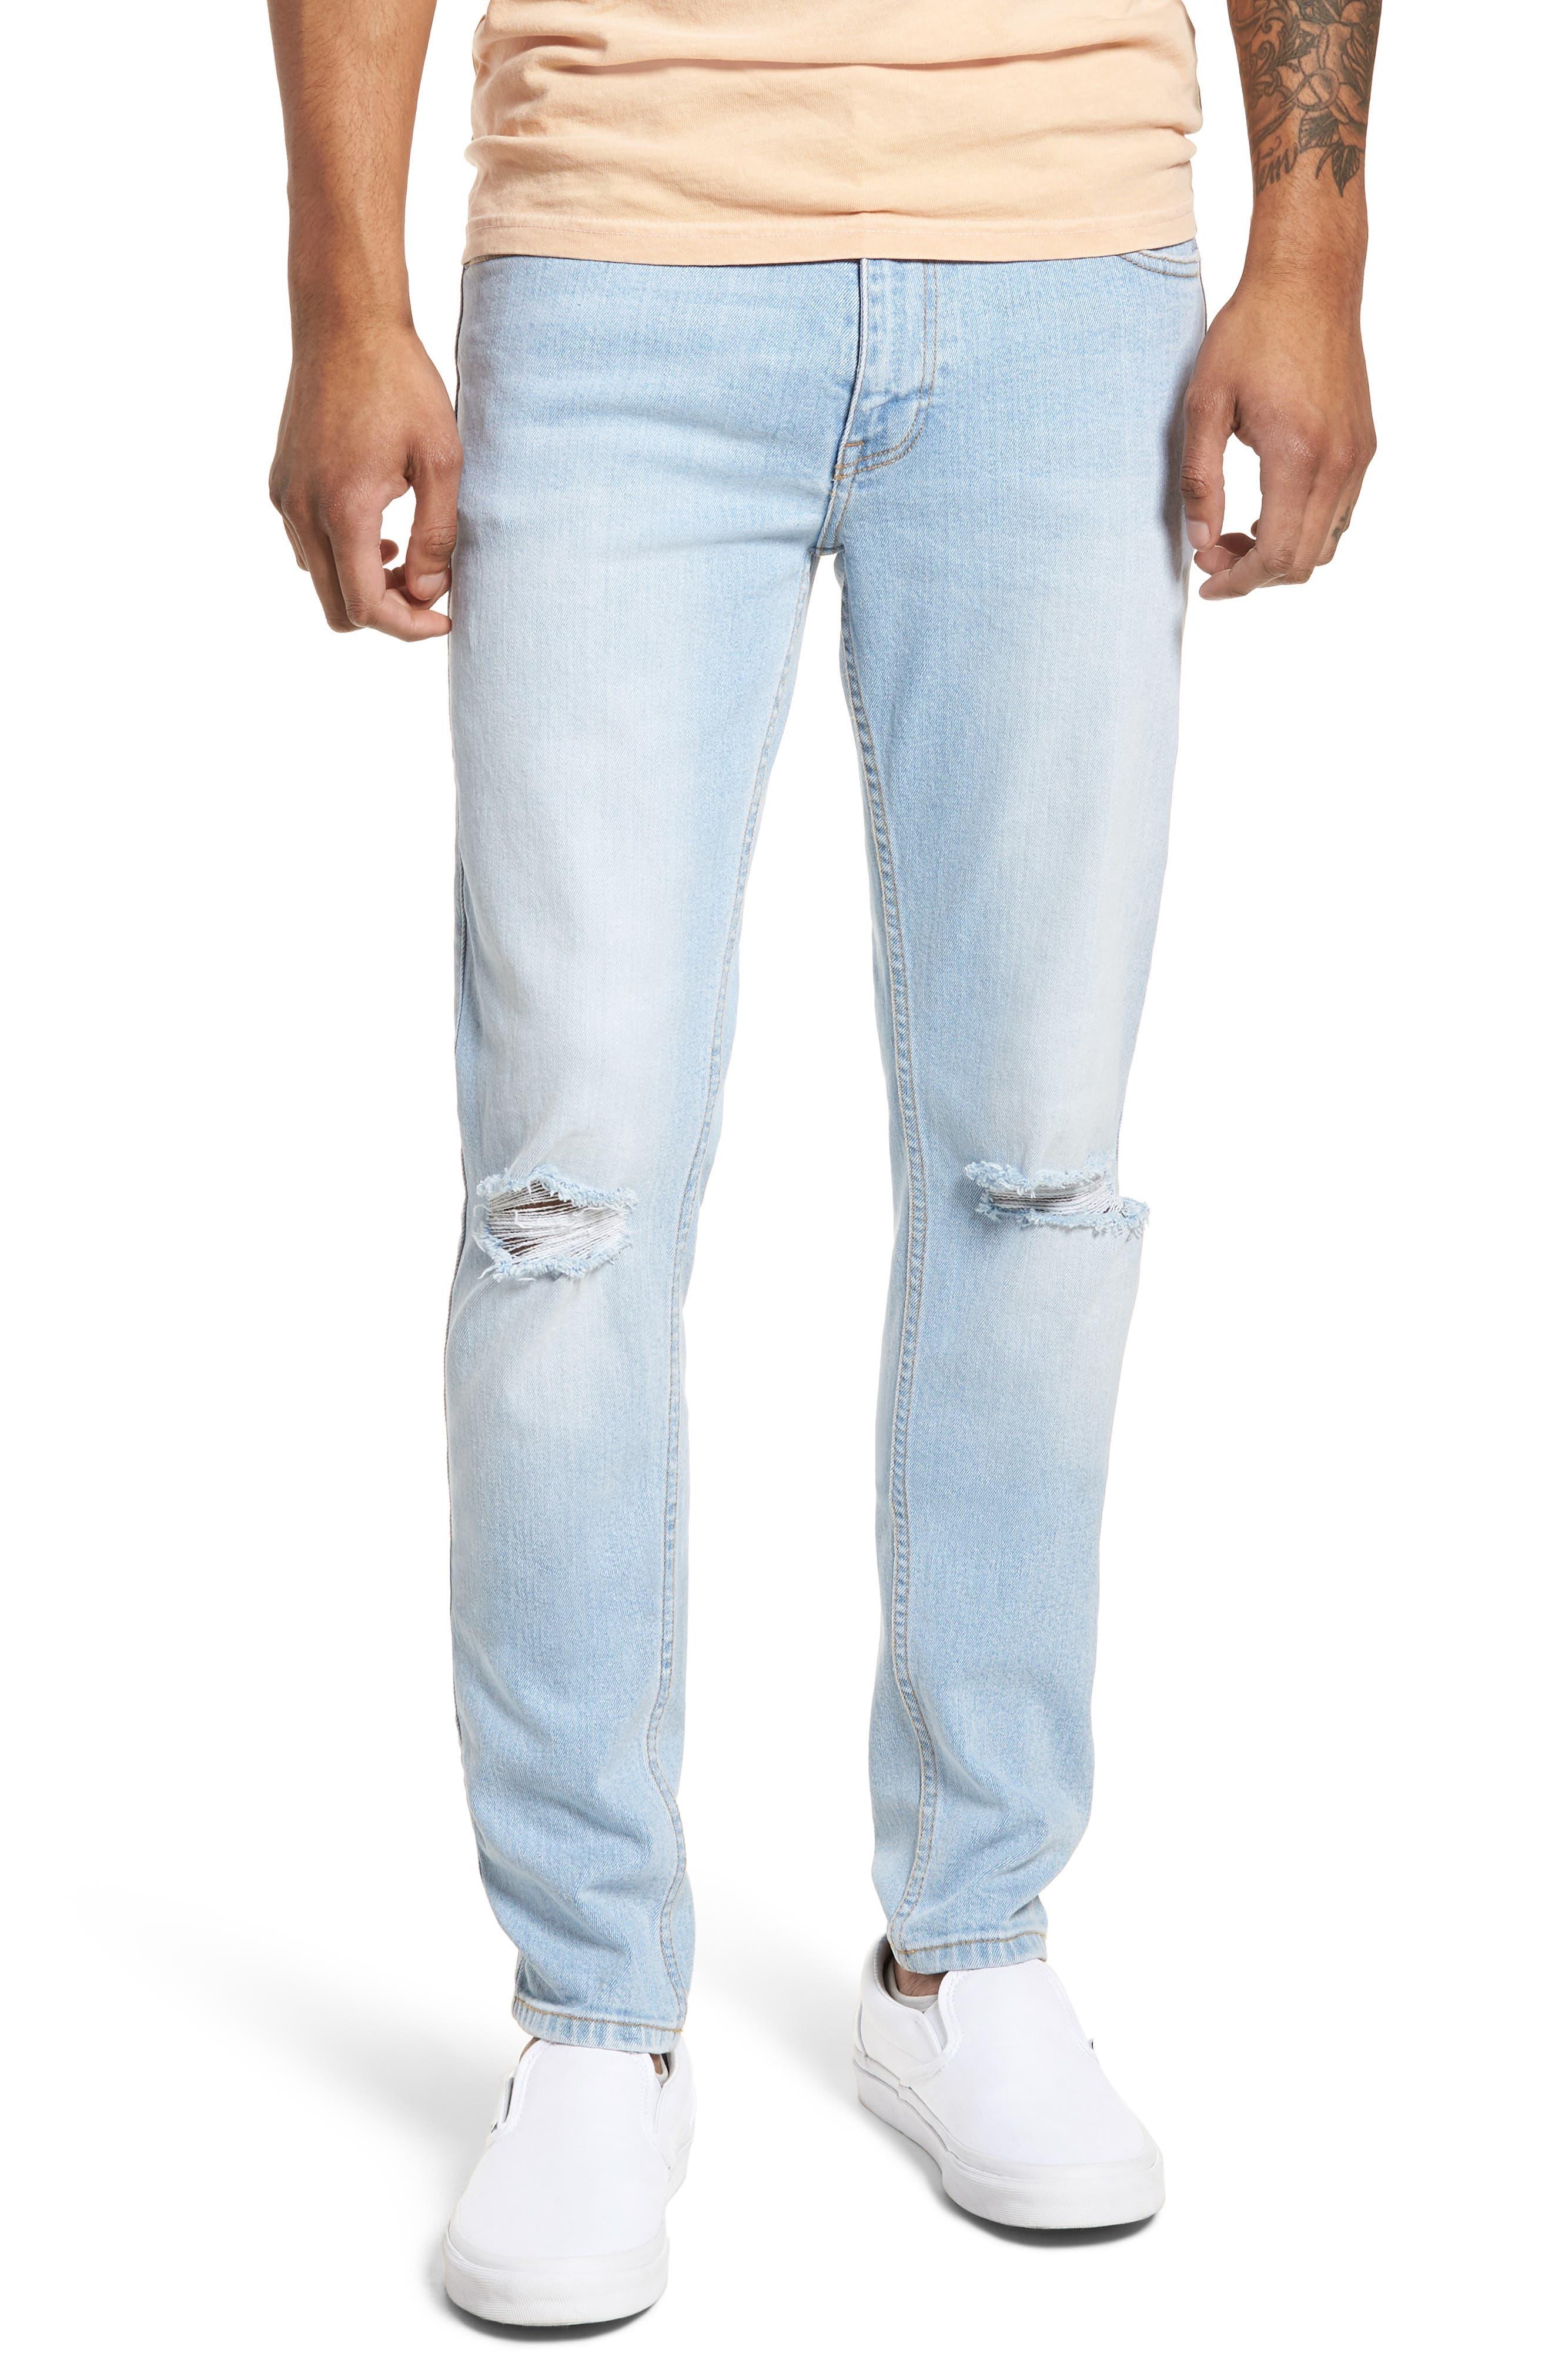 Clark Slim Straight Leg Jeans,                         Main,                         color, Superlight Blue Ripped